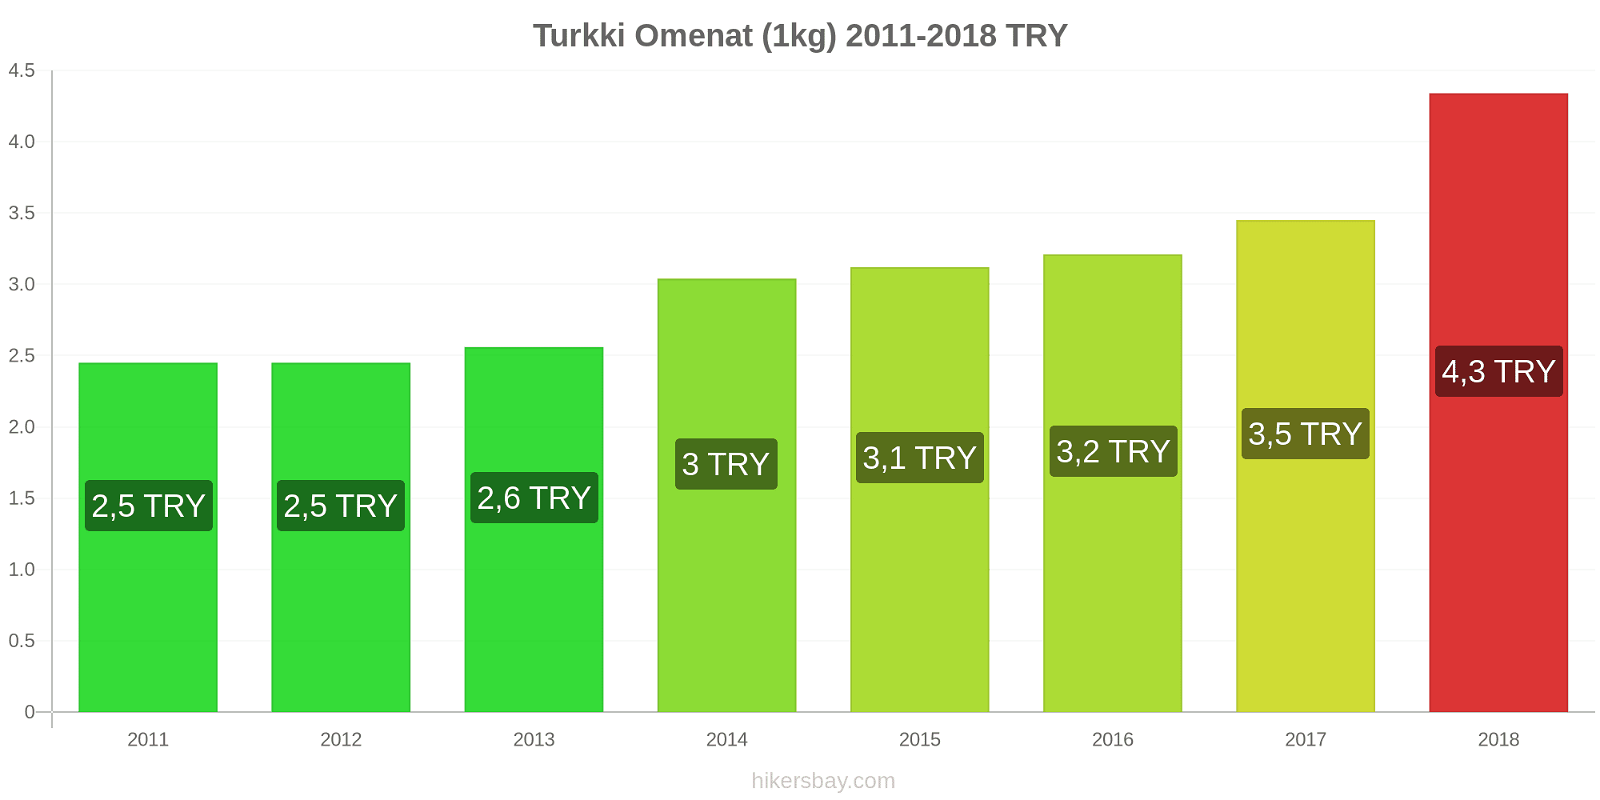 Turkki hintojen muutokset Omenat (1kg) hikersbay.com